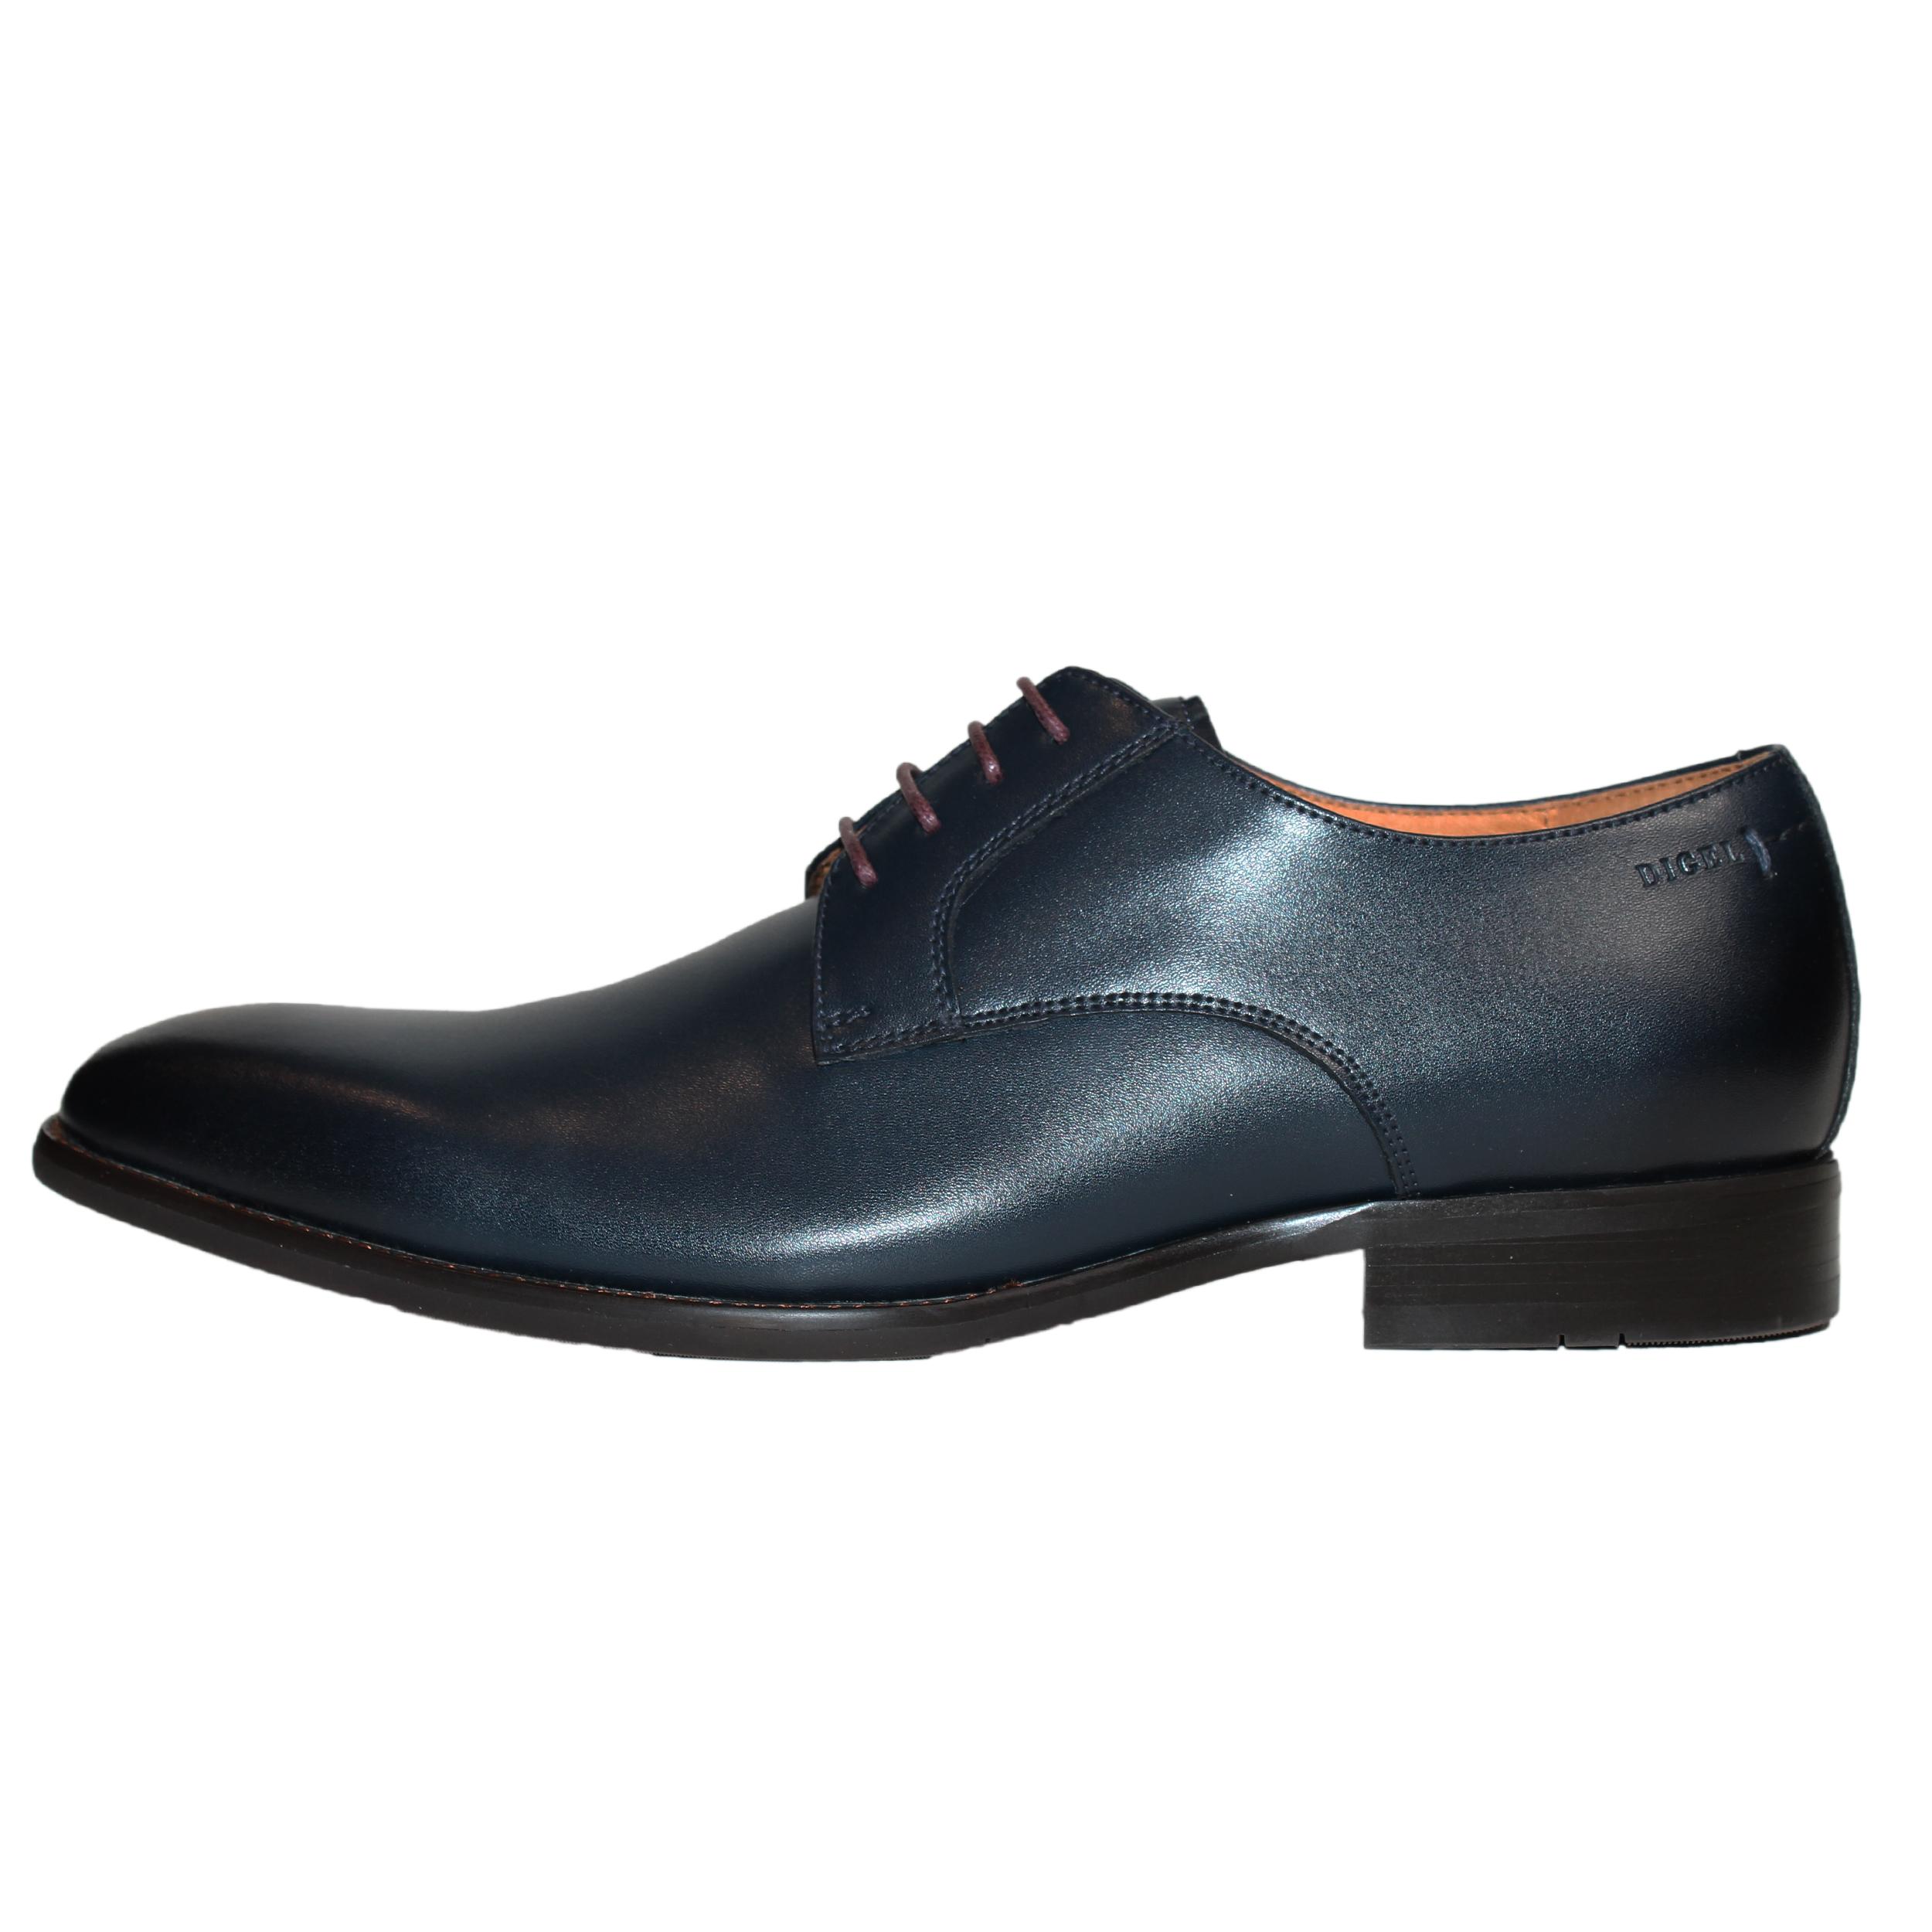 Digel Herren Schuh Simon Derby 41 dunkelblau